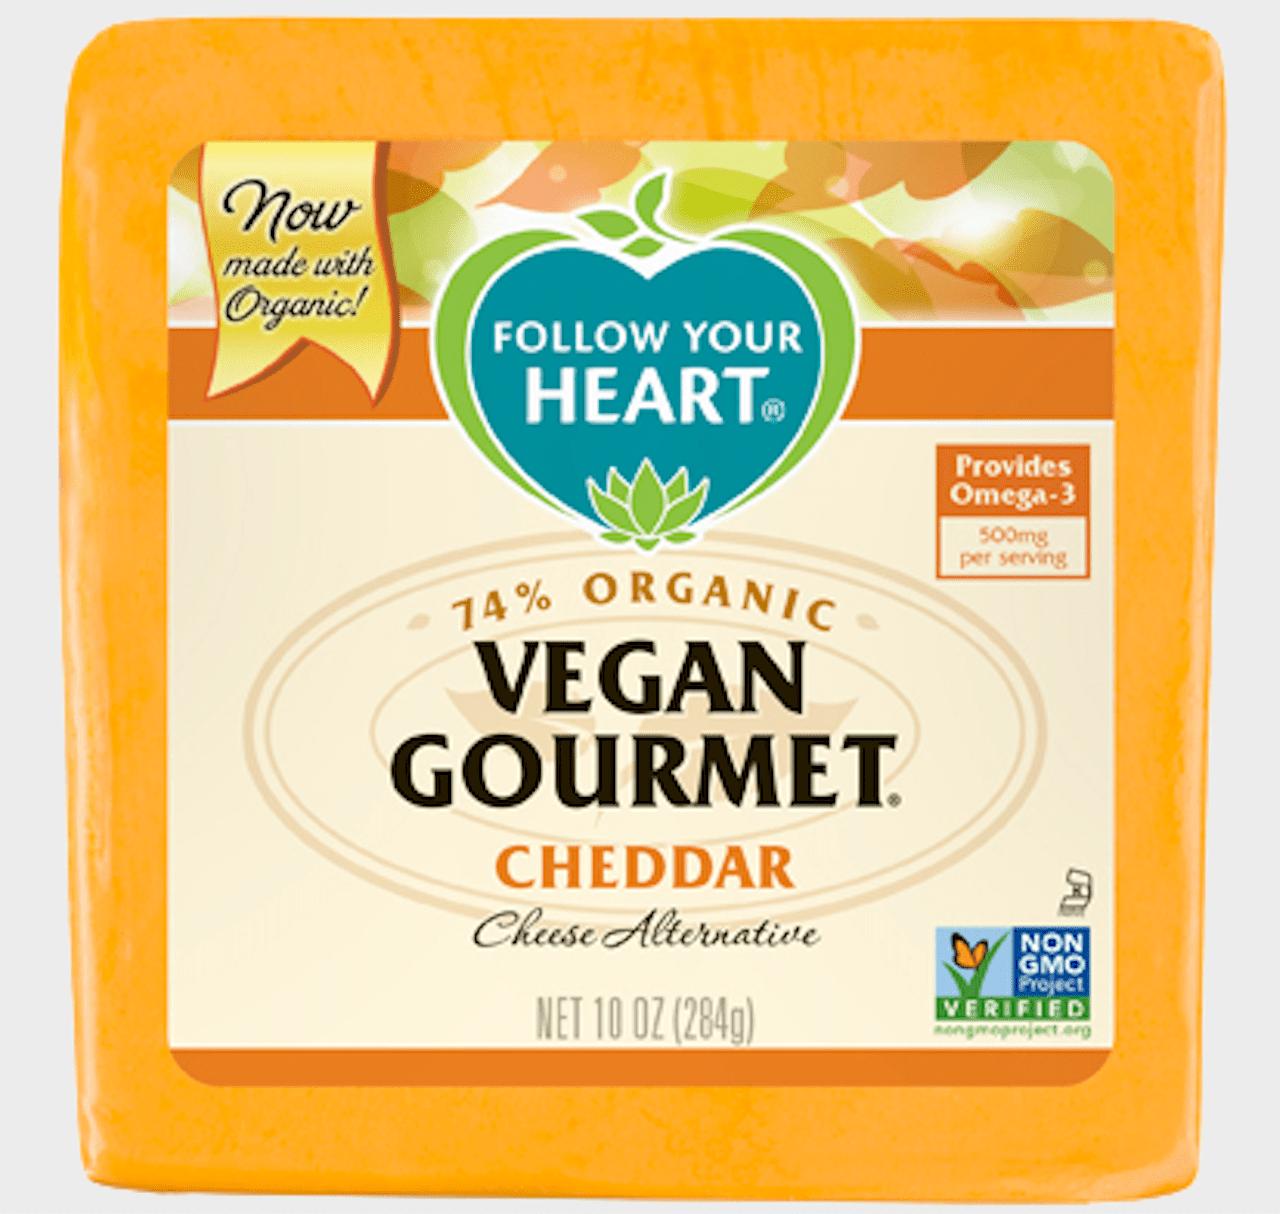 Follow Your Heart Vegan Gourmet Cheddar